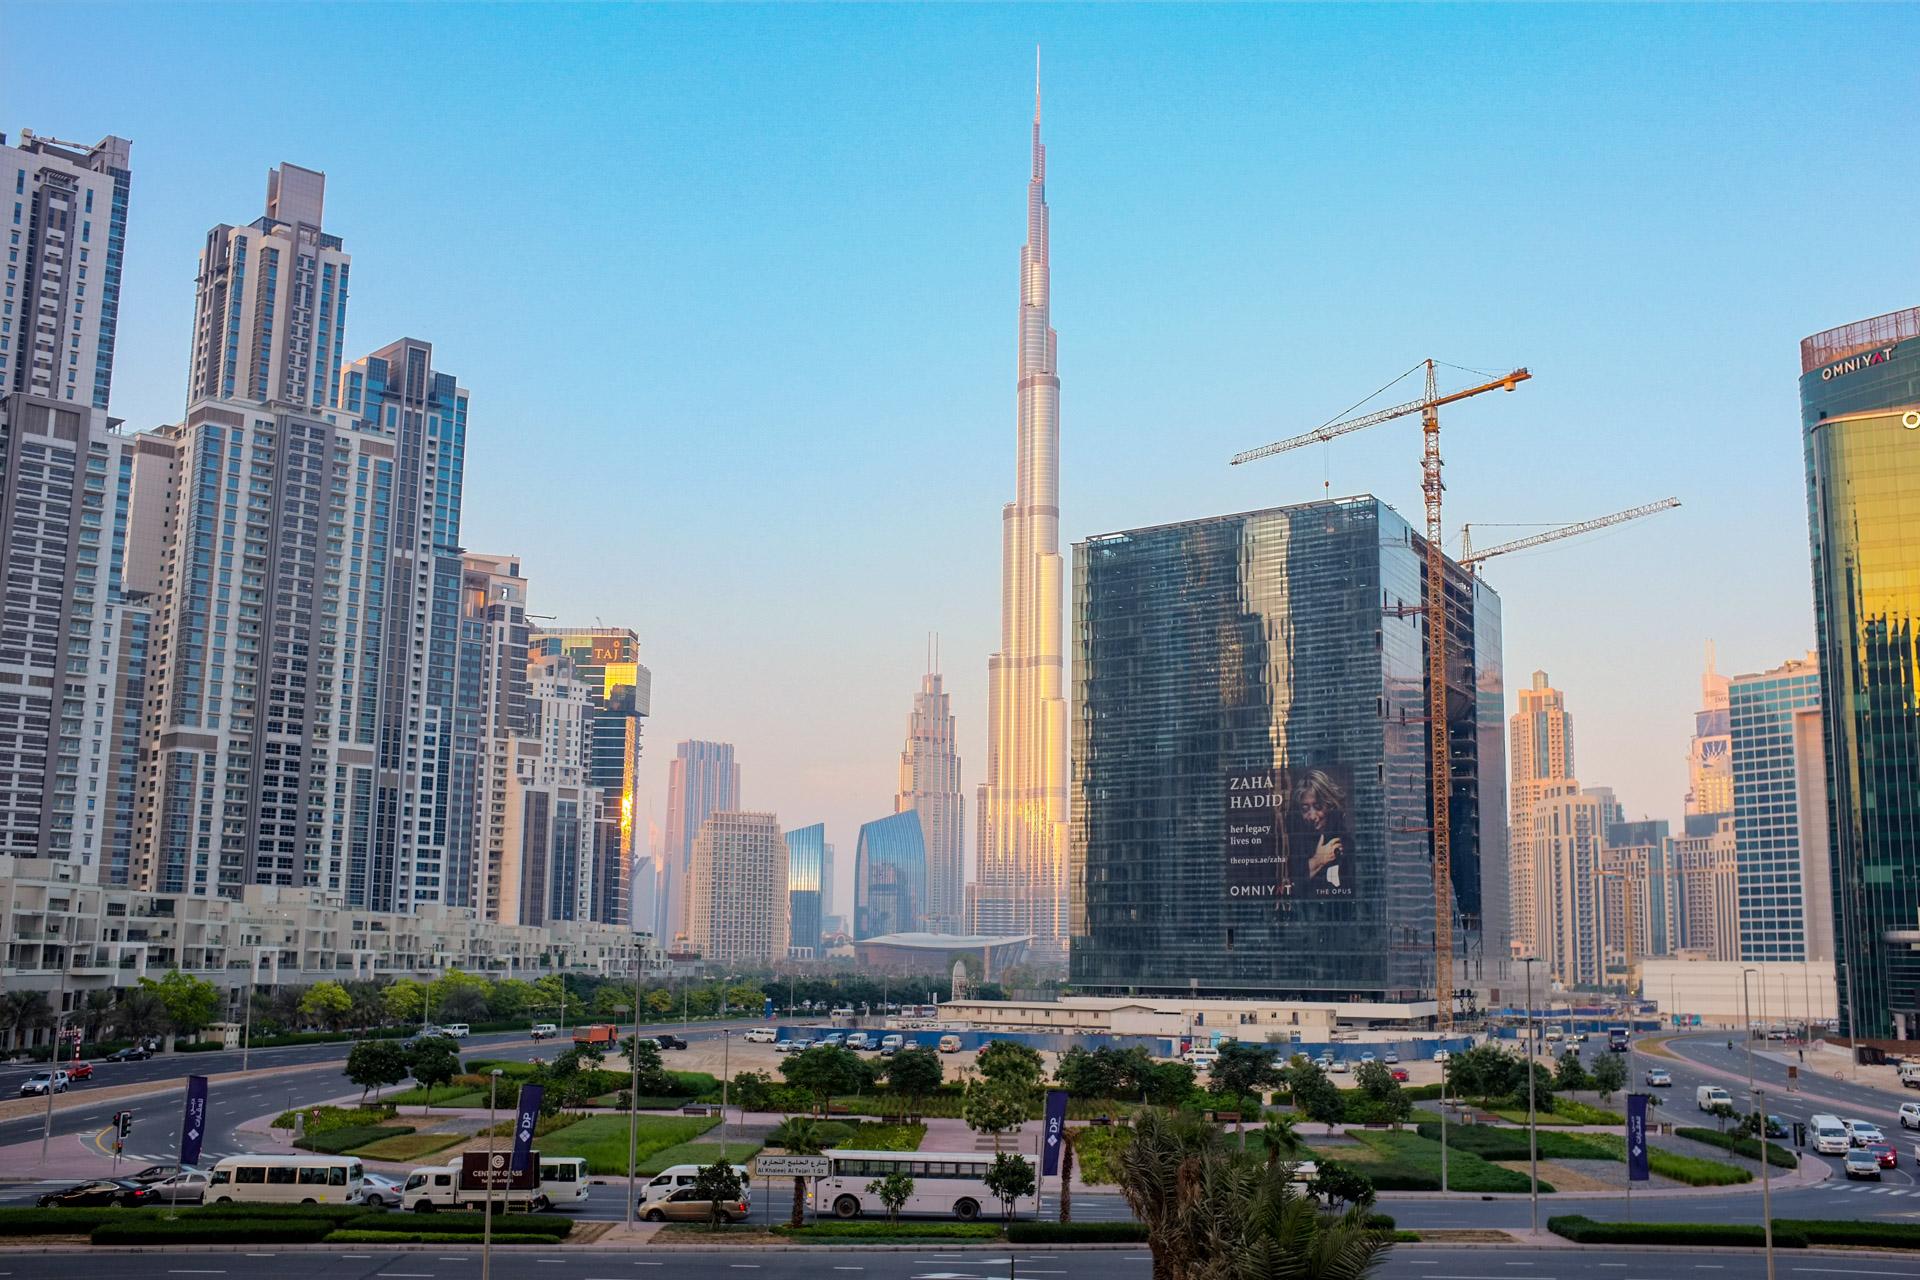 An Impressive view of Burj Khalifa and Downtown Dubai from The Oberoi.